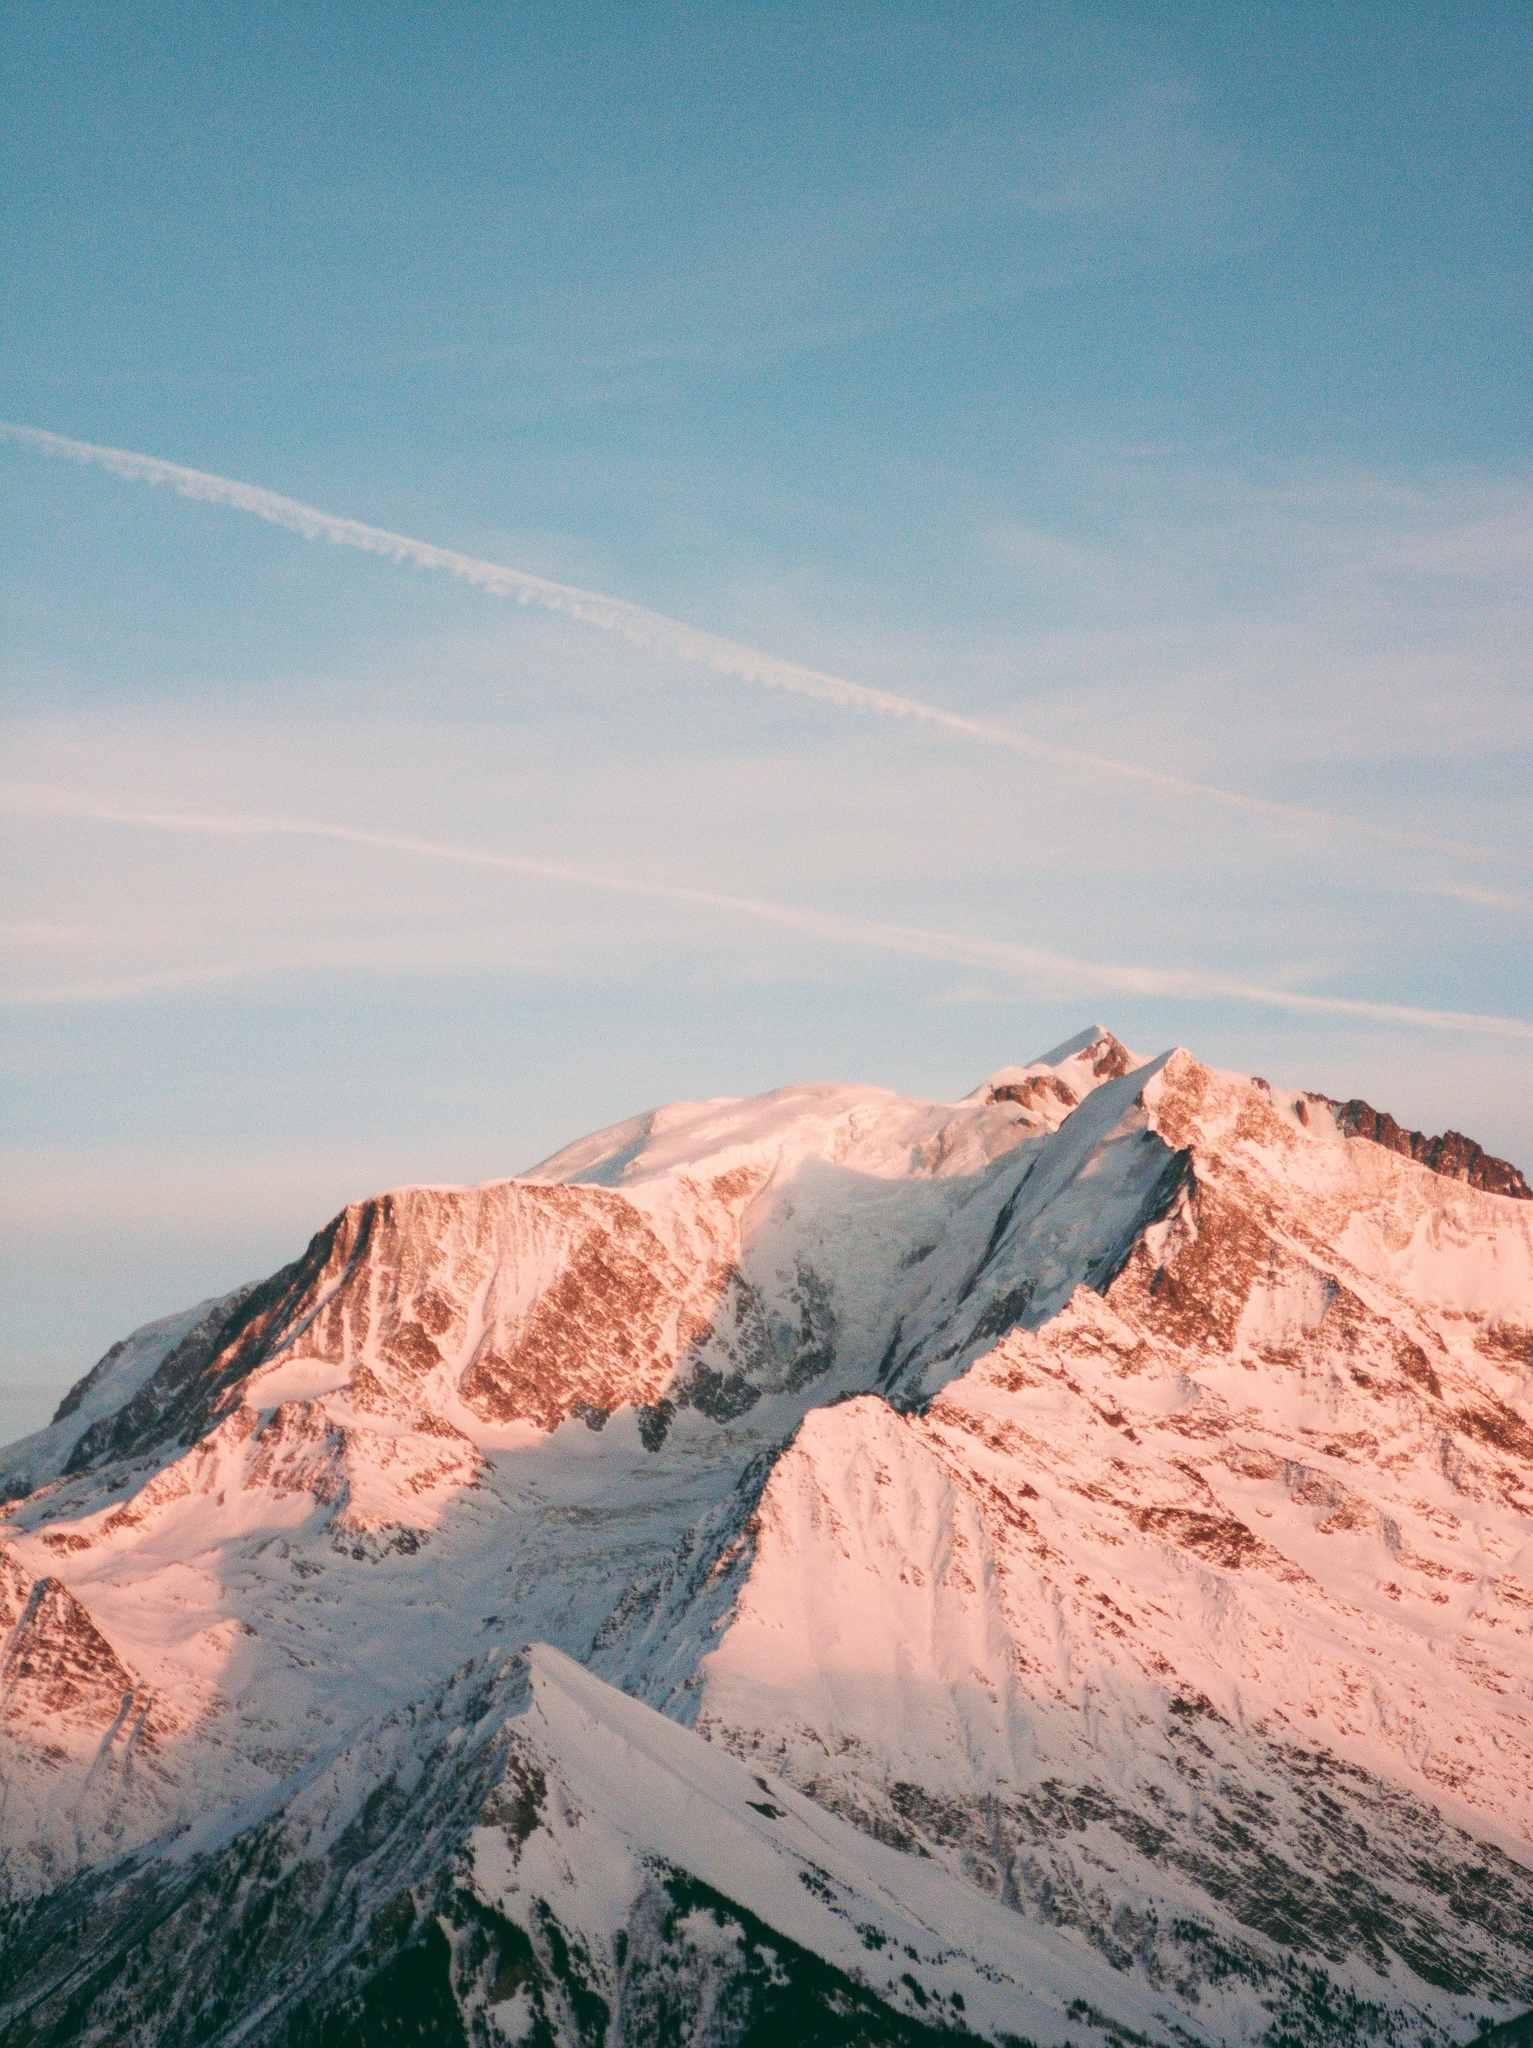 karlı dağ, iç anadolu